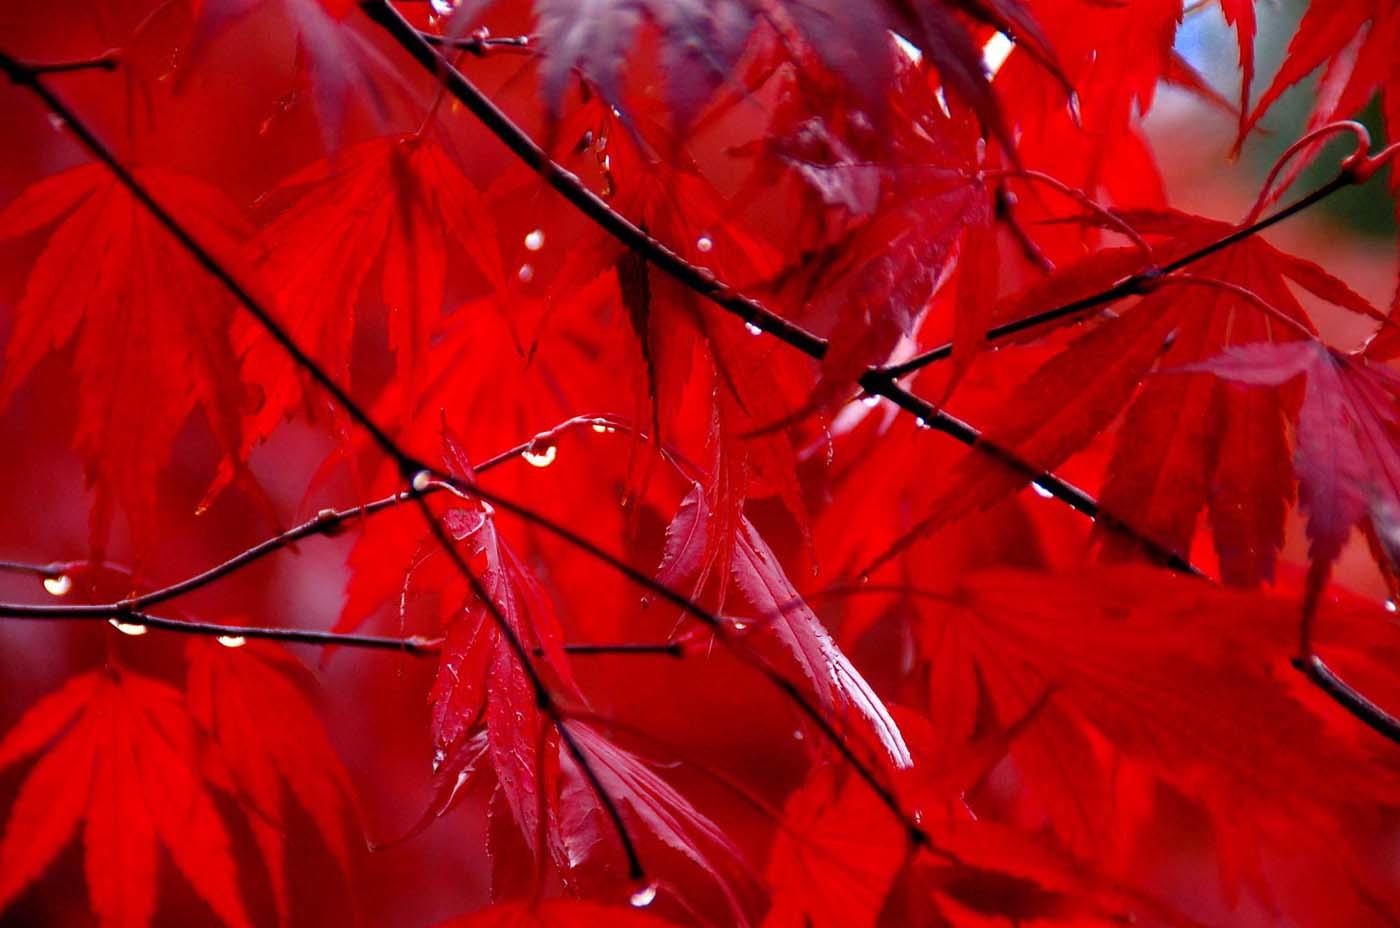 140 DOPK_Red Drops.jpg